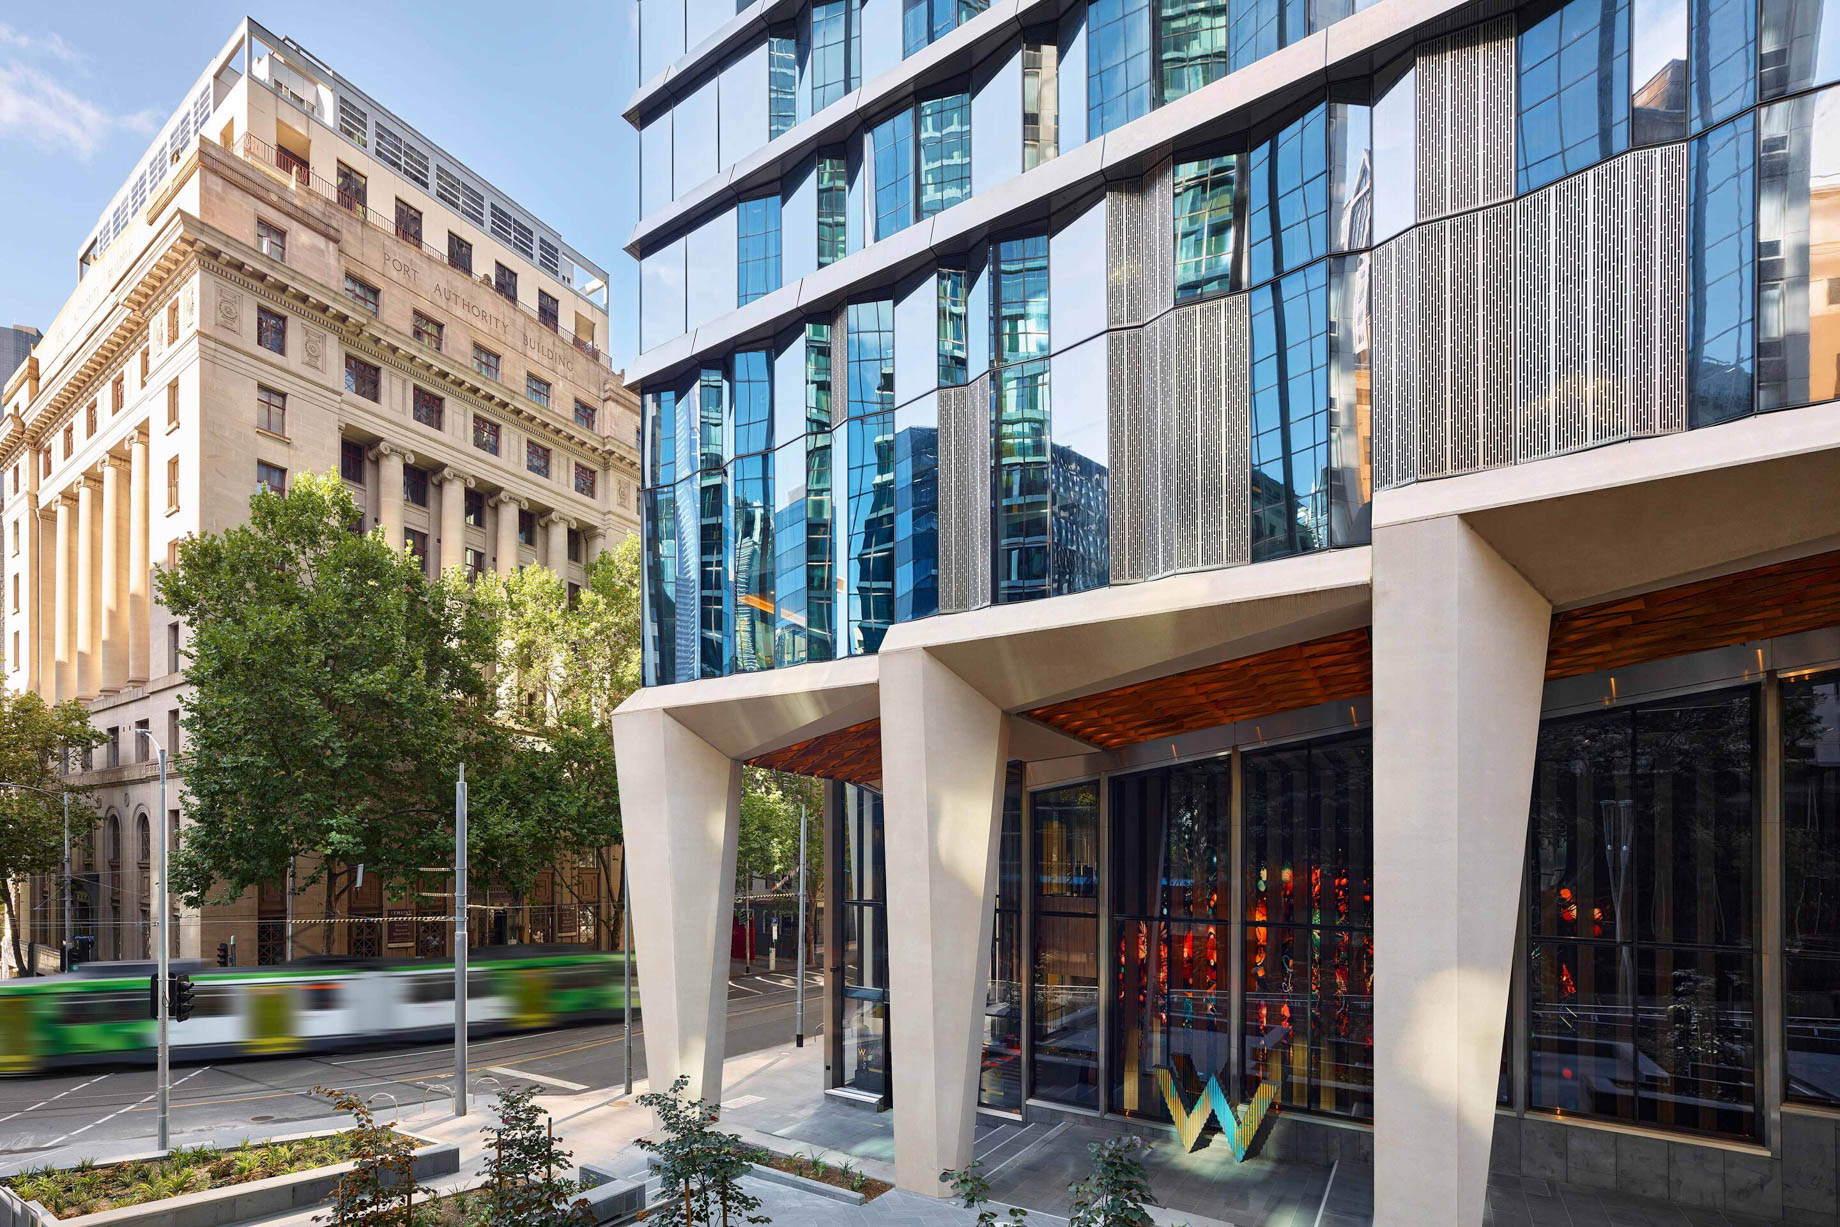 W Melbourne Luxury Hotel - Melbourne, Australia - Hotel Exterior View_